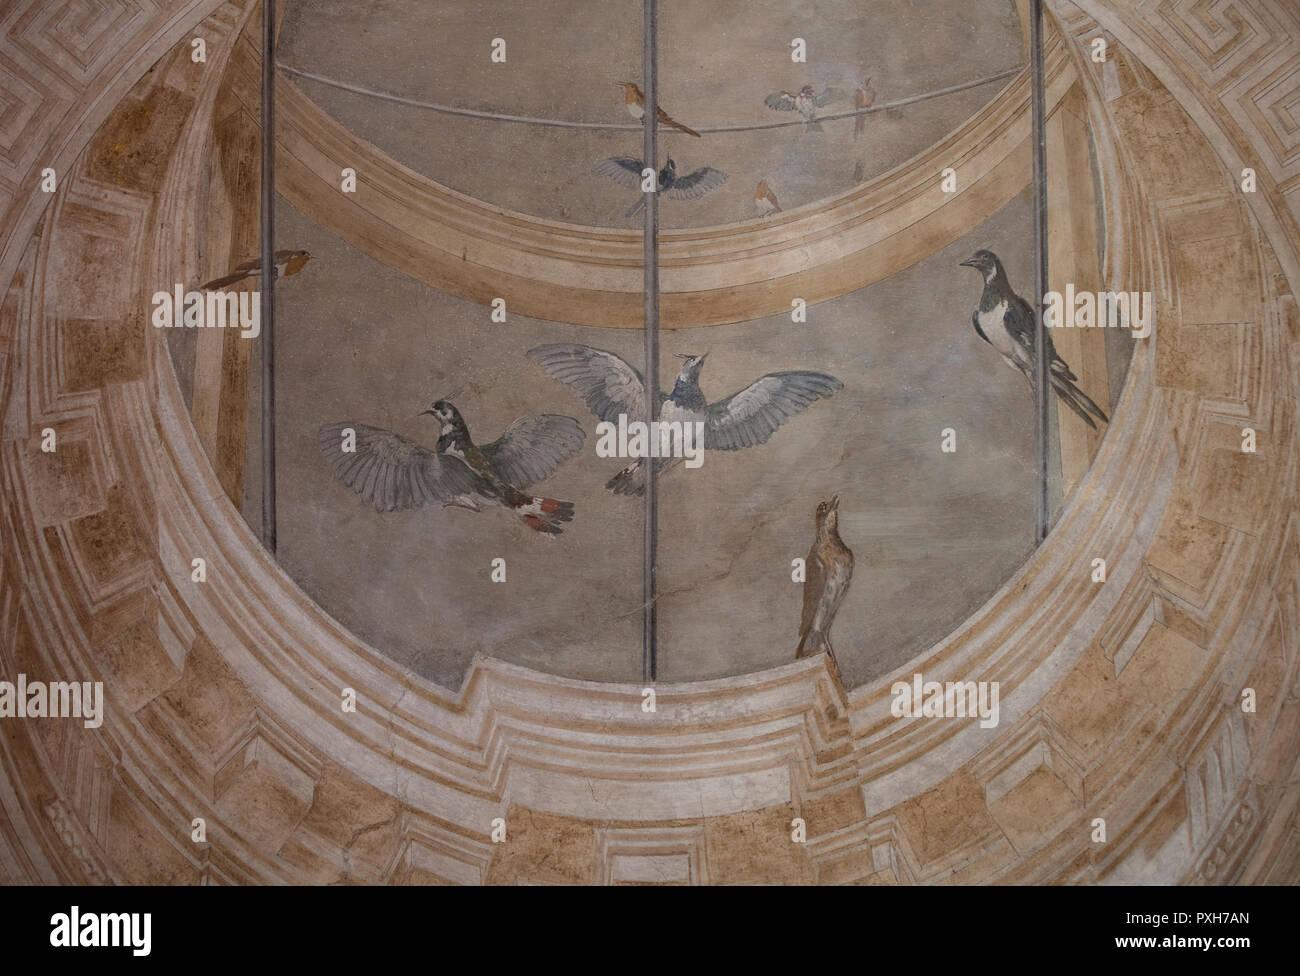 Detail of a renaissance ceiling fresco in the garden pavilion of Villa Lante. The fresco shows lifelike birds against a false-perspective dome. - Stock Image